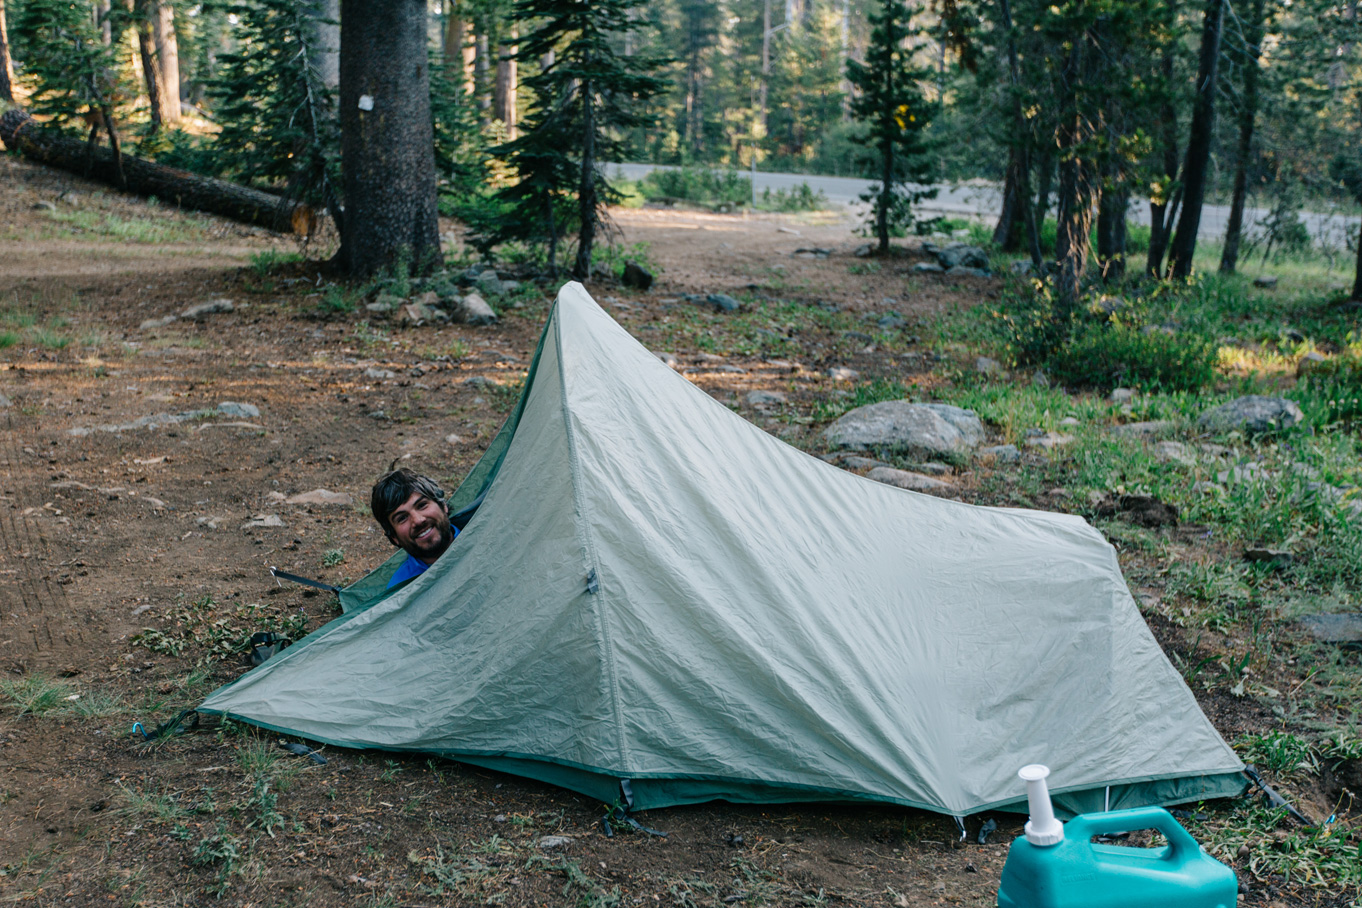 CindyGiovagnoli_outdoors_photographer_Sierra_Buttes_firetower_watchtower_Sardine_Snag_Bear_lake_hike_swim_camp-045.jpg